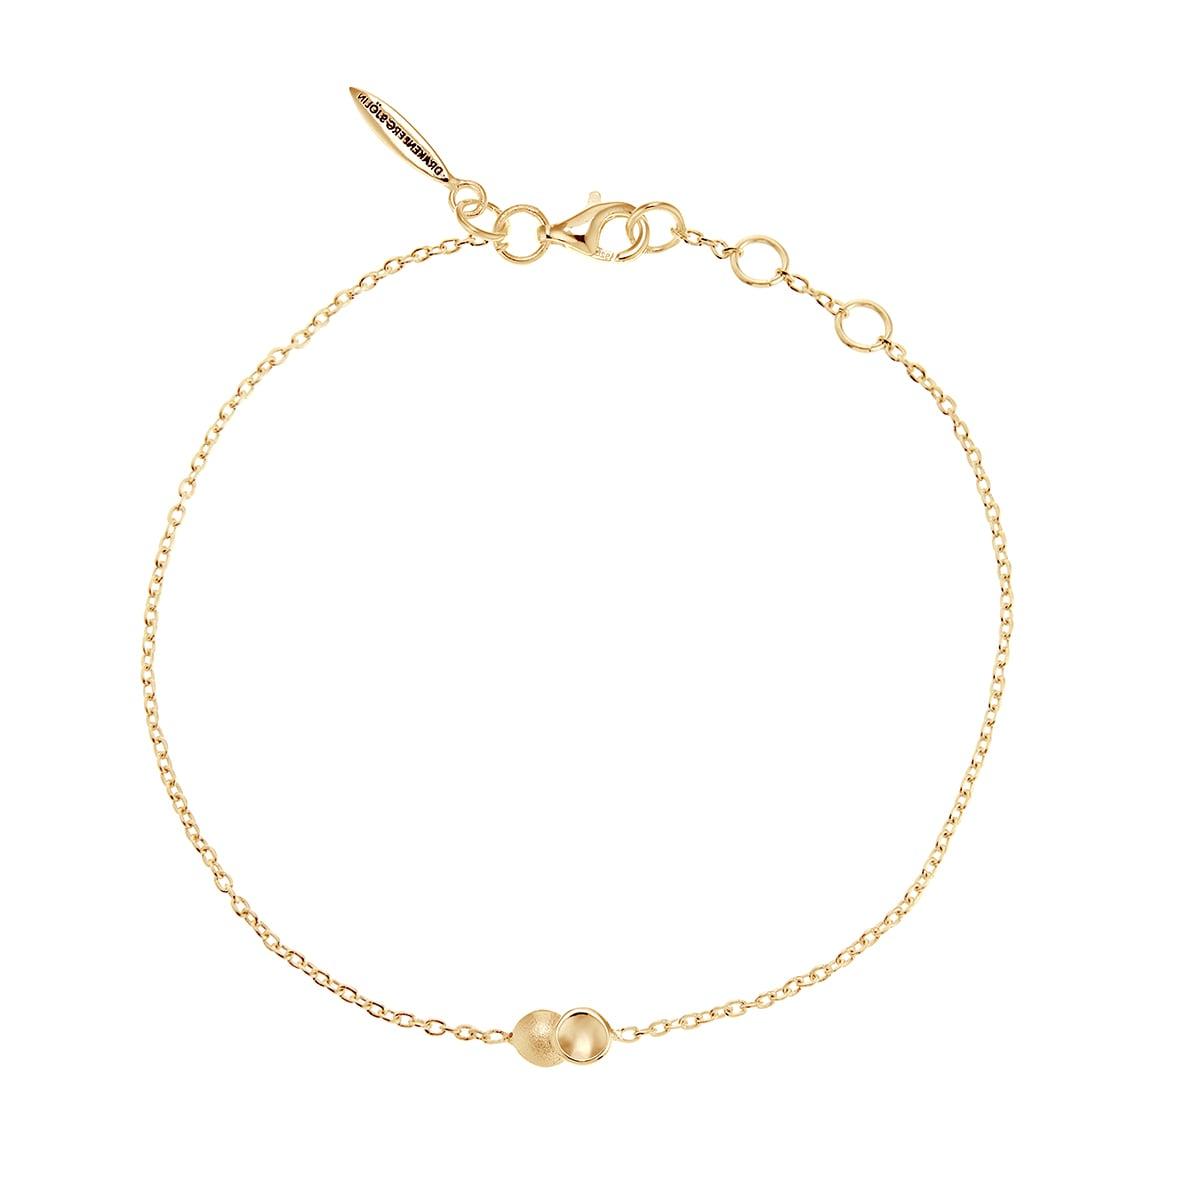 Drakenberg_Sjölin_Rocky Shore drop bracelet gold_RSE-B10180 G_Hos_Jarl_Sandin